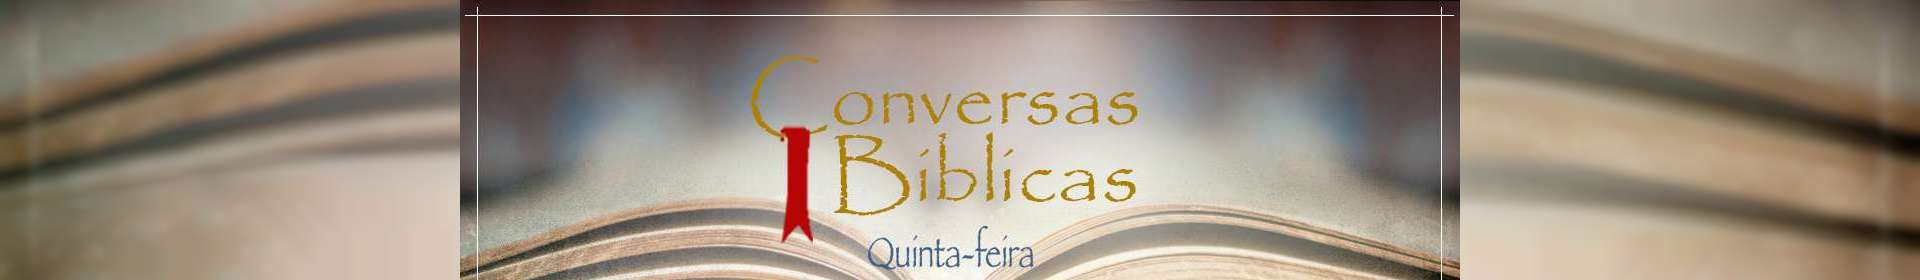 Conversas Bíblicas: Bíblia, Palavra Viva - Parte 1